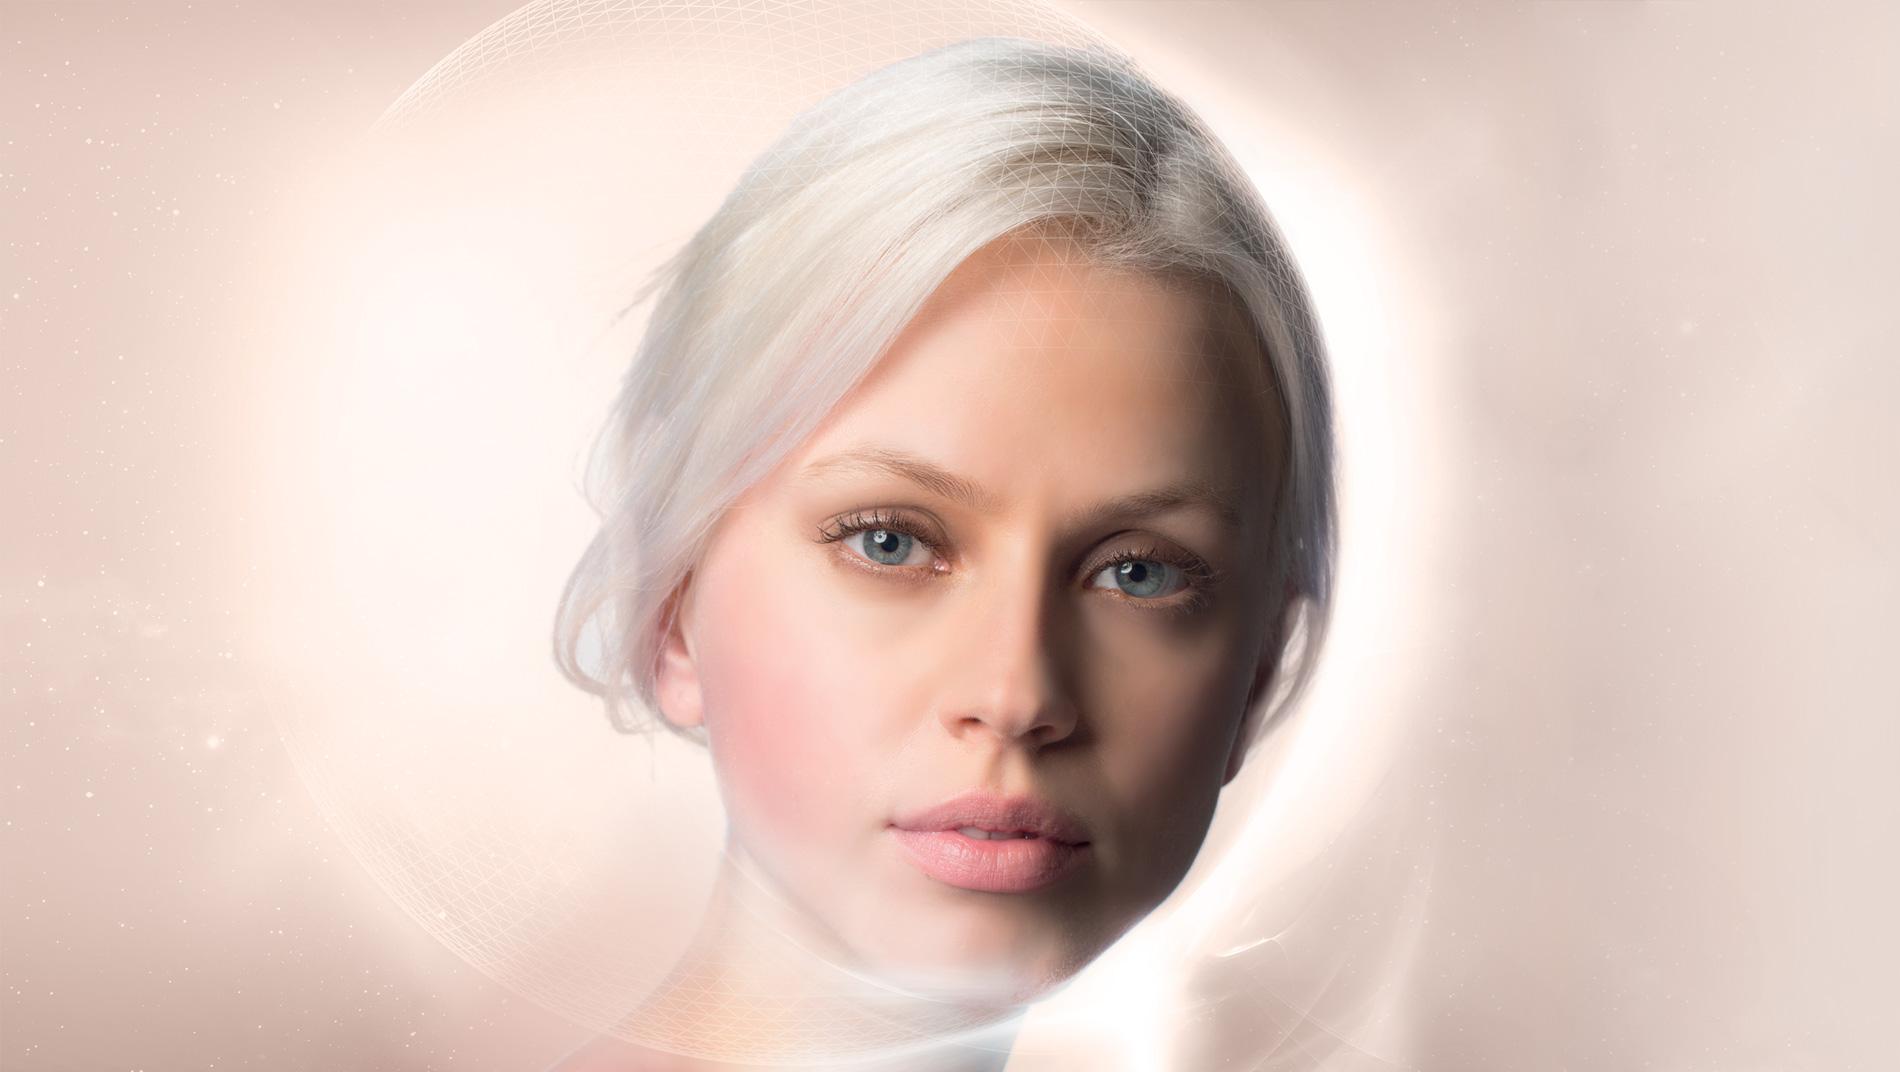 teoxane-visuel-campagne-agence-communication-medical-karma-sante-nice-paris-6